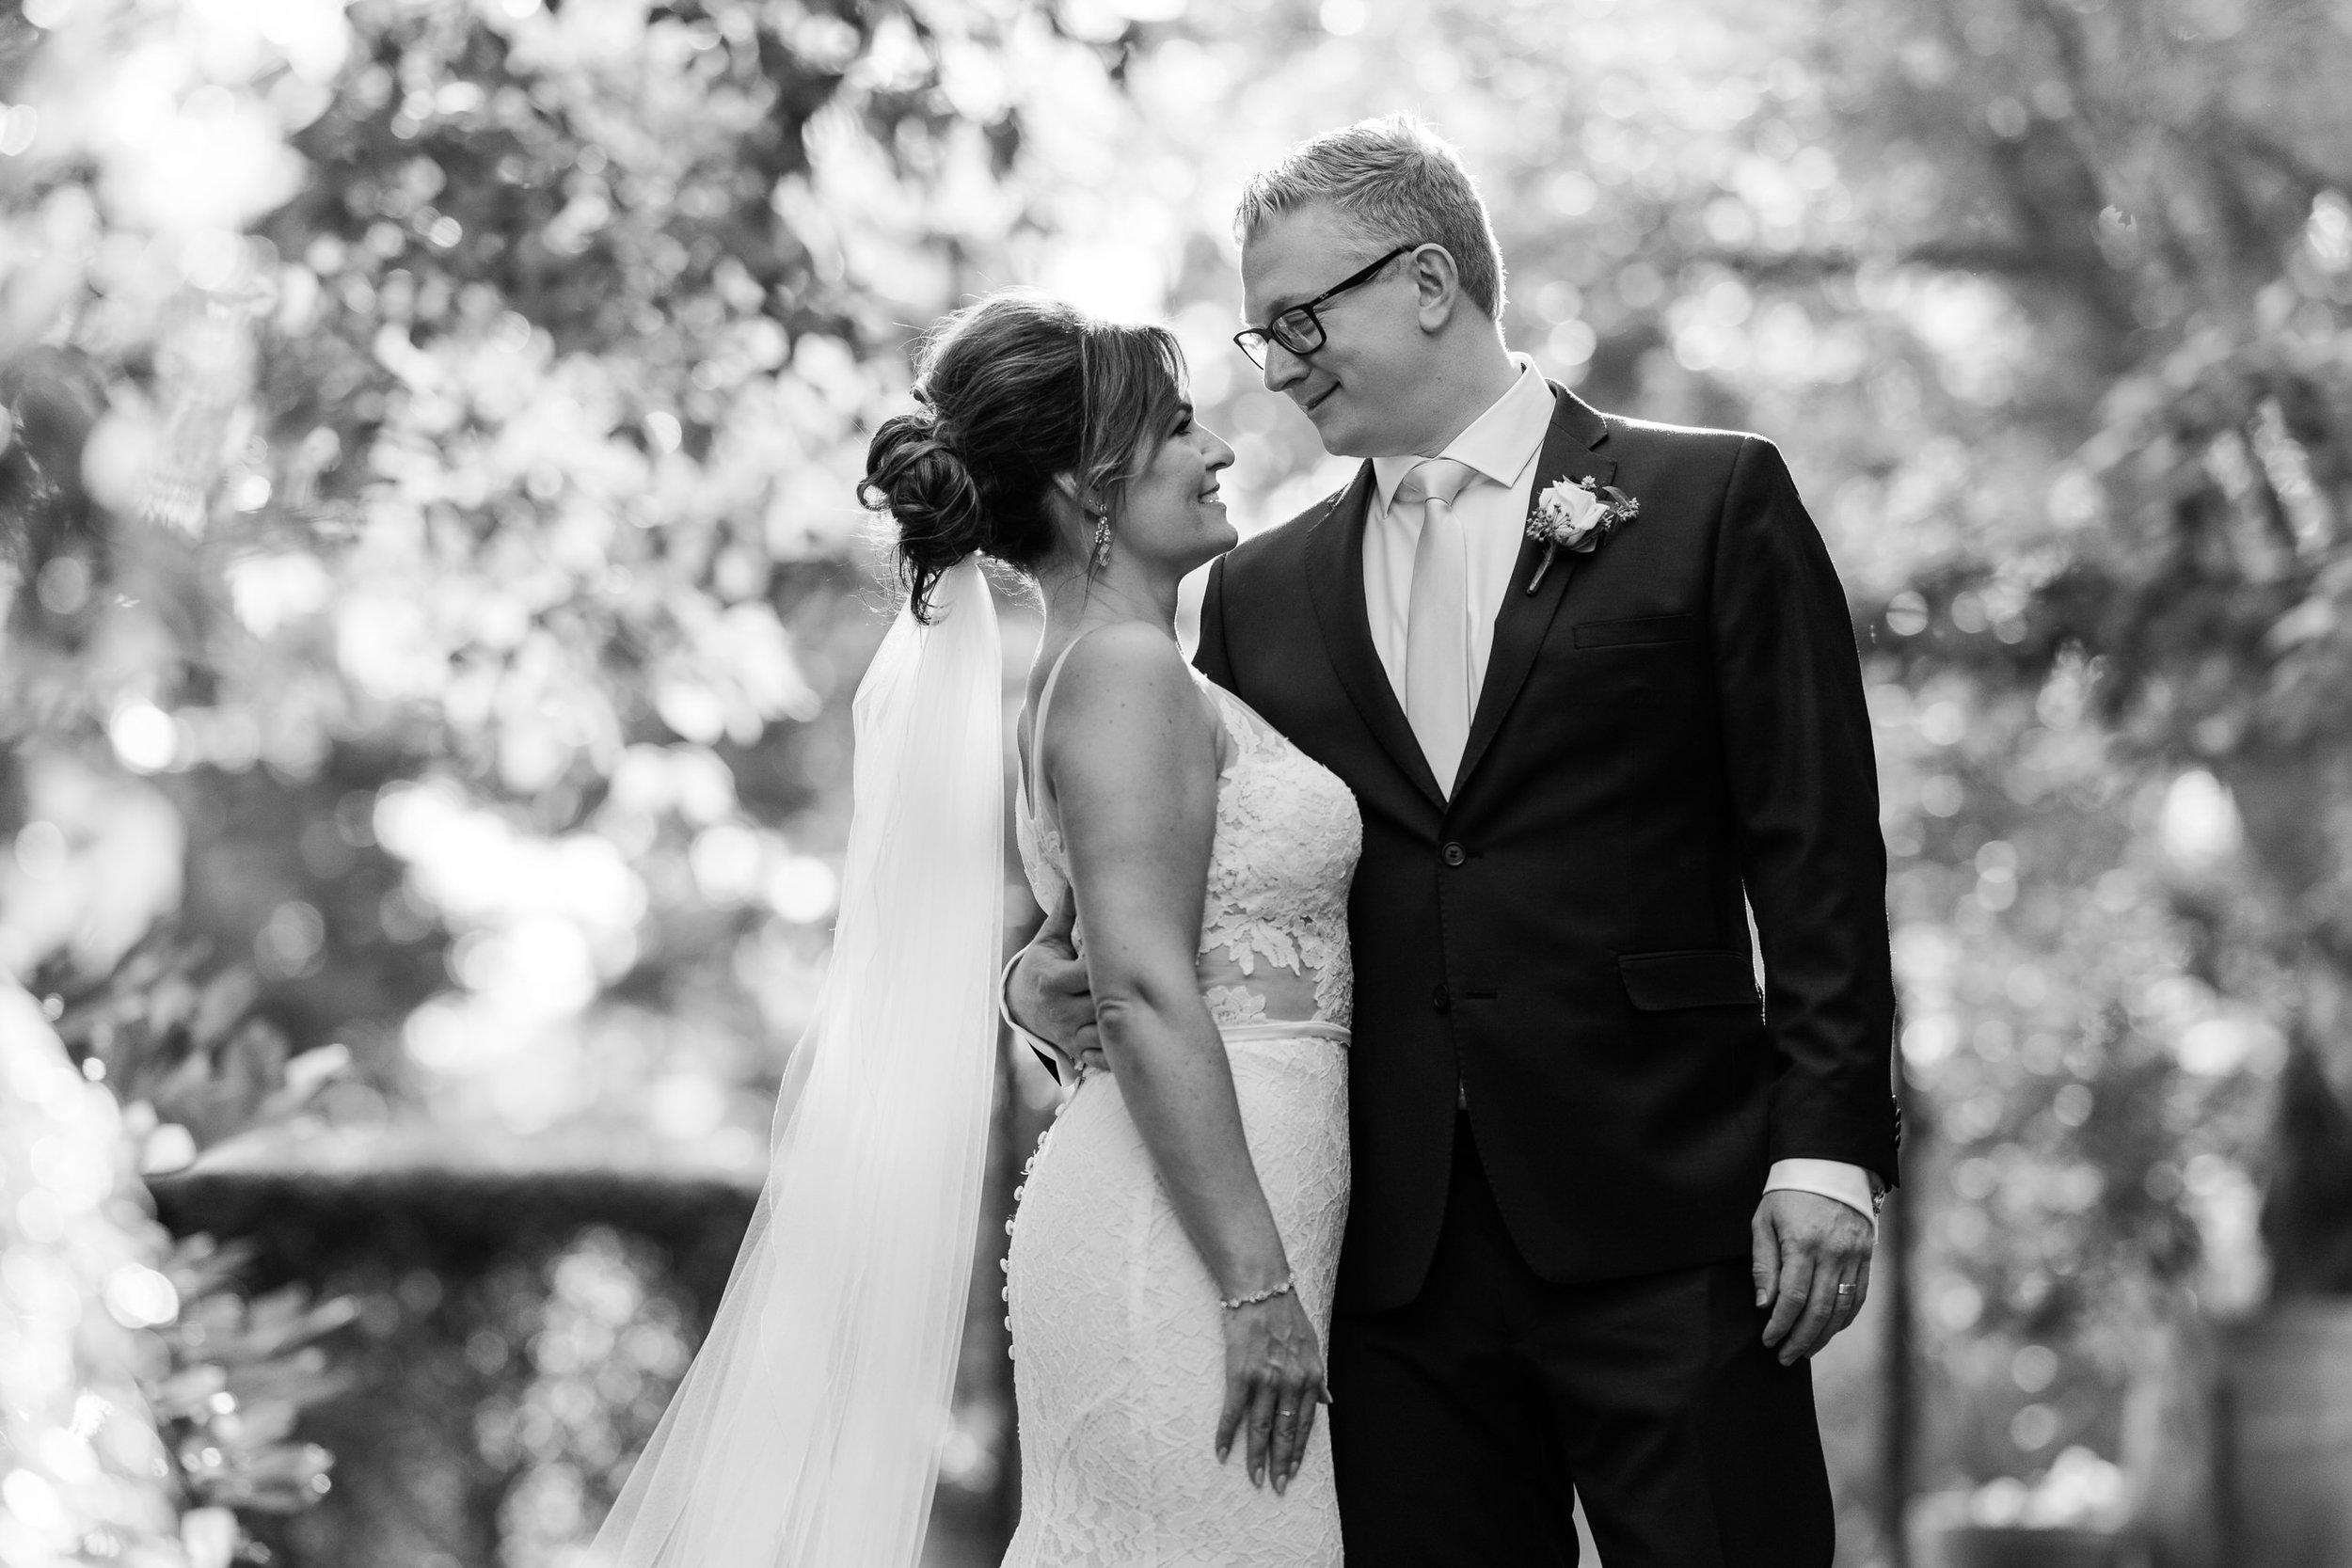 Justin_And_Jim_Photography_Chateau_Dore_Bendigo_Wedding53.JPG